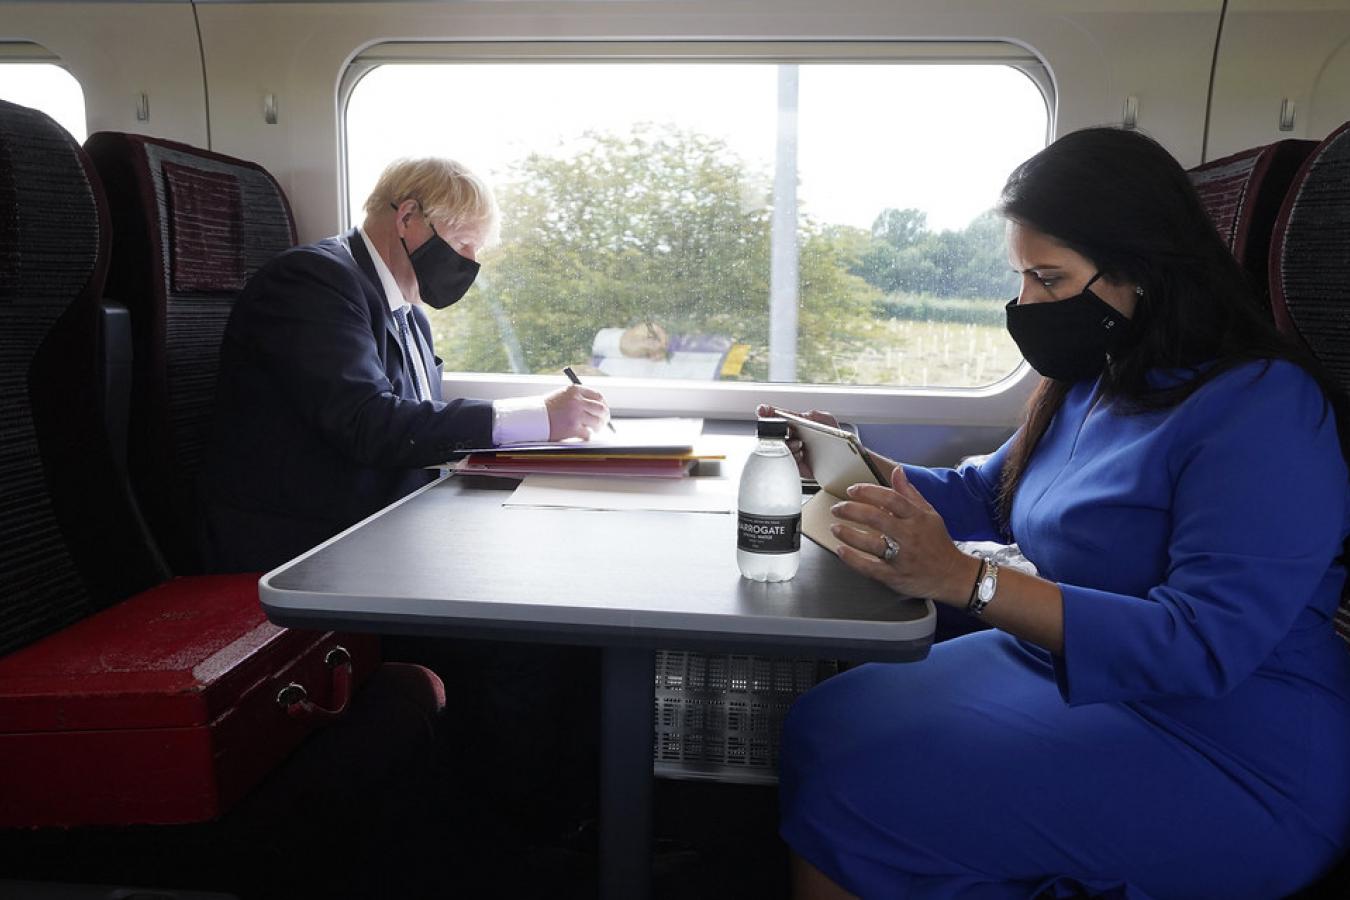 Boris Johnson Prime Minister and Priti Patel Home Secretary working on the Train 30 July 2020